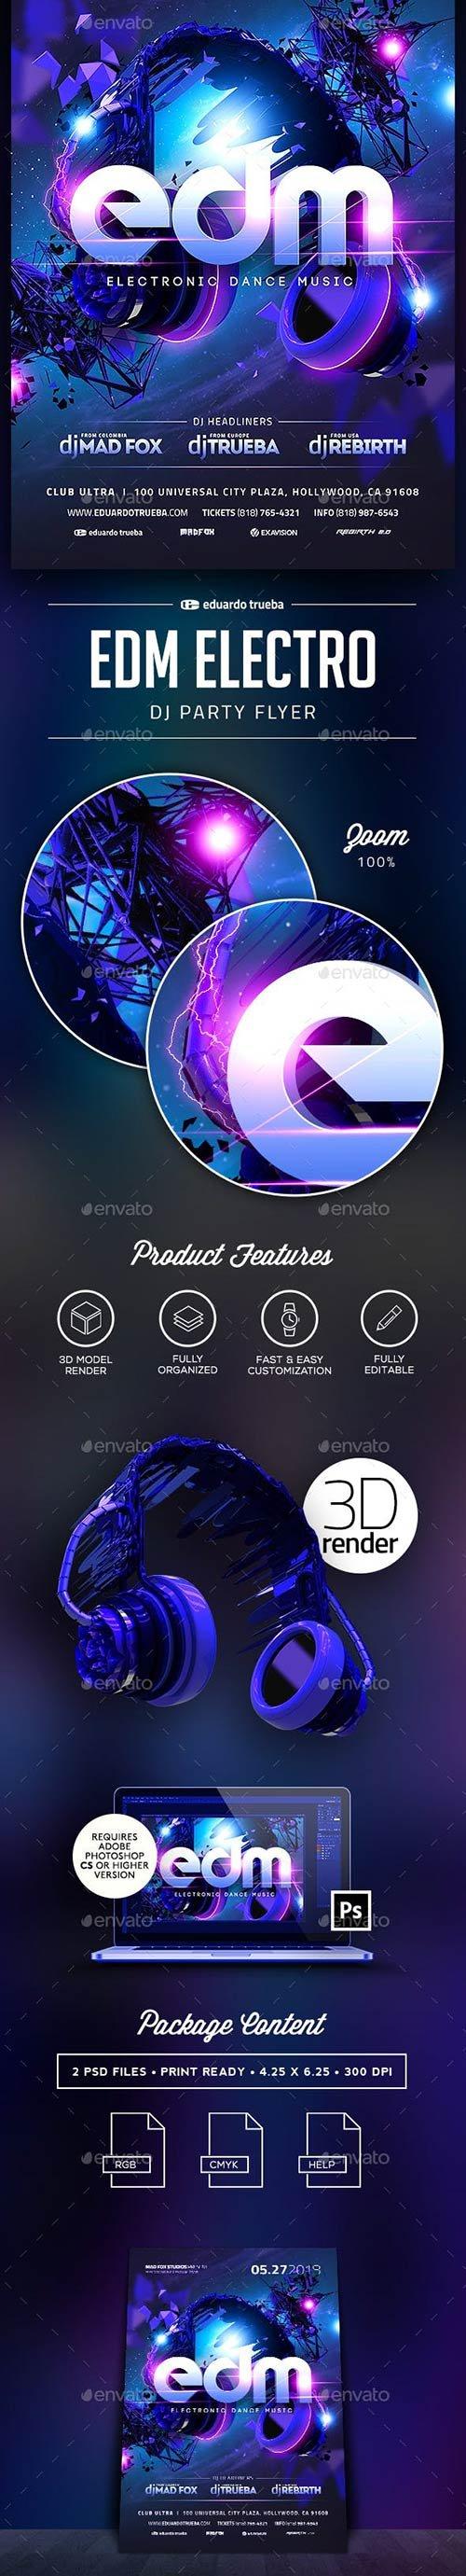 GraphicRiver - EDM Electro Dj Party Flyer 22607840